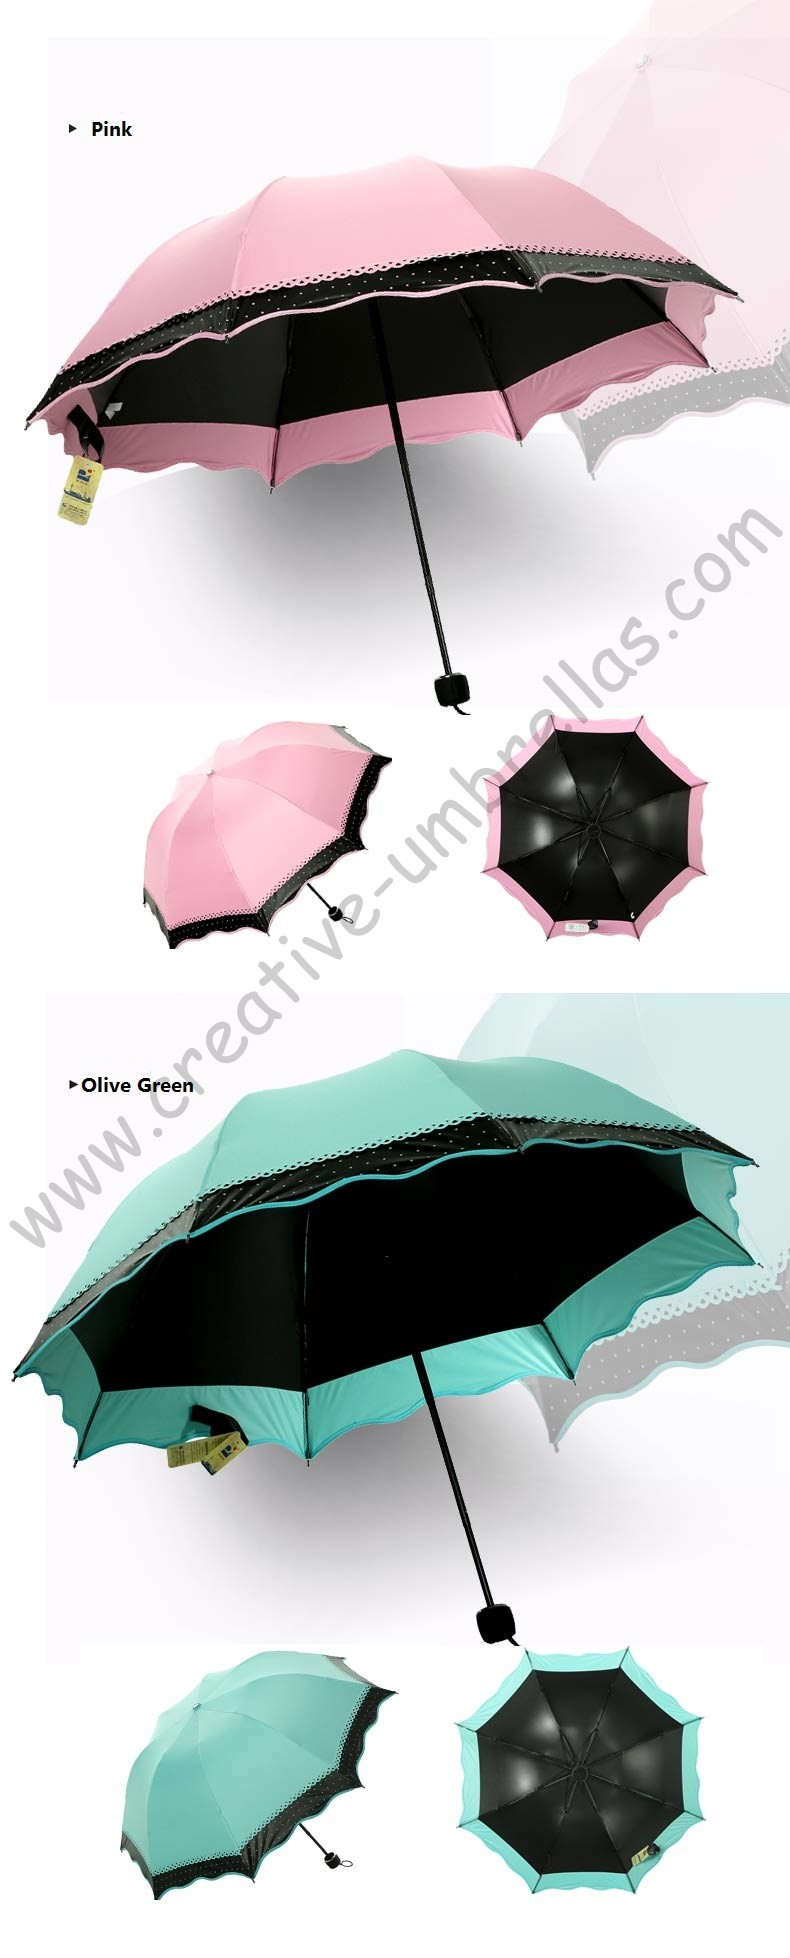 Objective Original Xiaomi Mijia Automatic Folding Sunny Rainy Umbrella Parasol Aluminum Windproof Waterproof Uv 50 Parasol Man Woman High Quality And Inexpensive Consumer Electronics